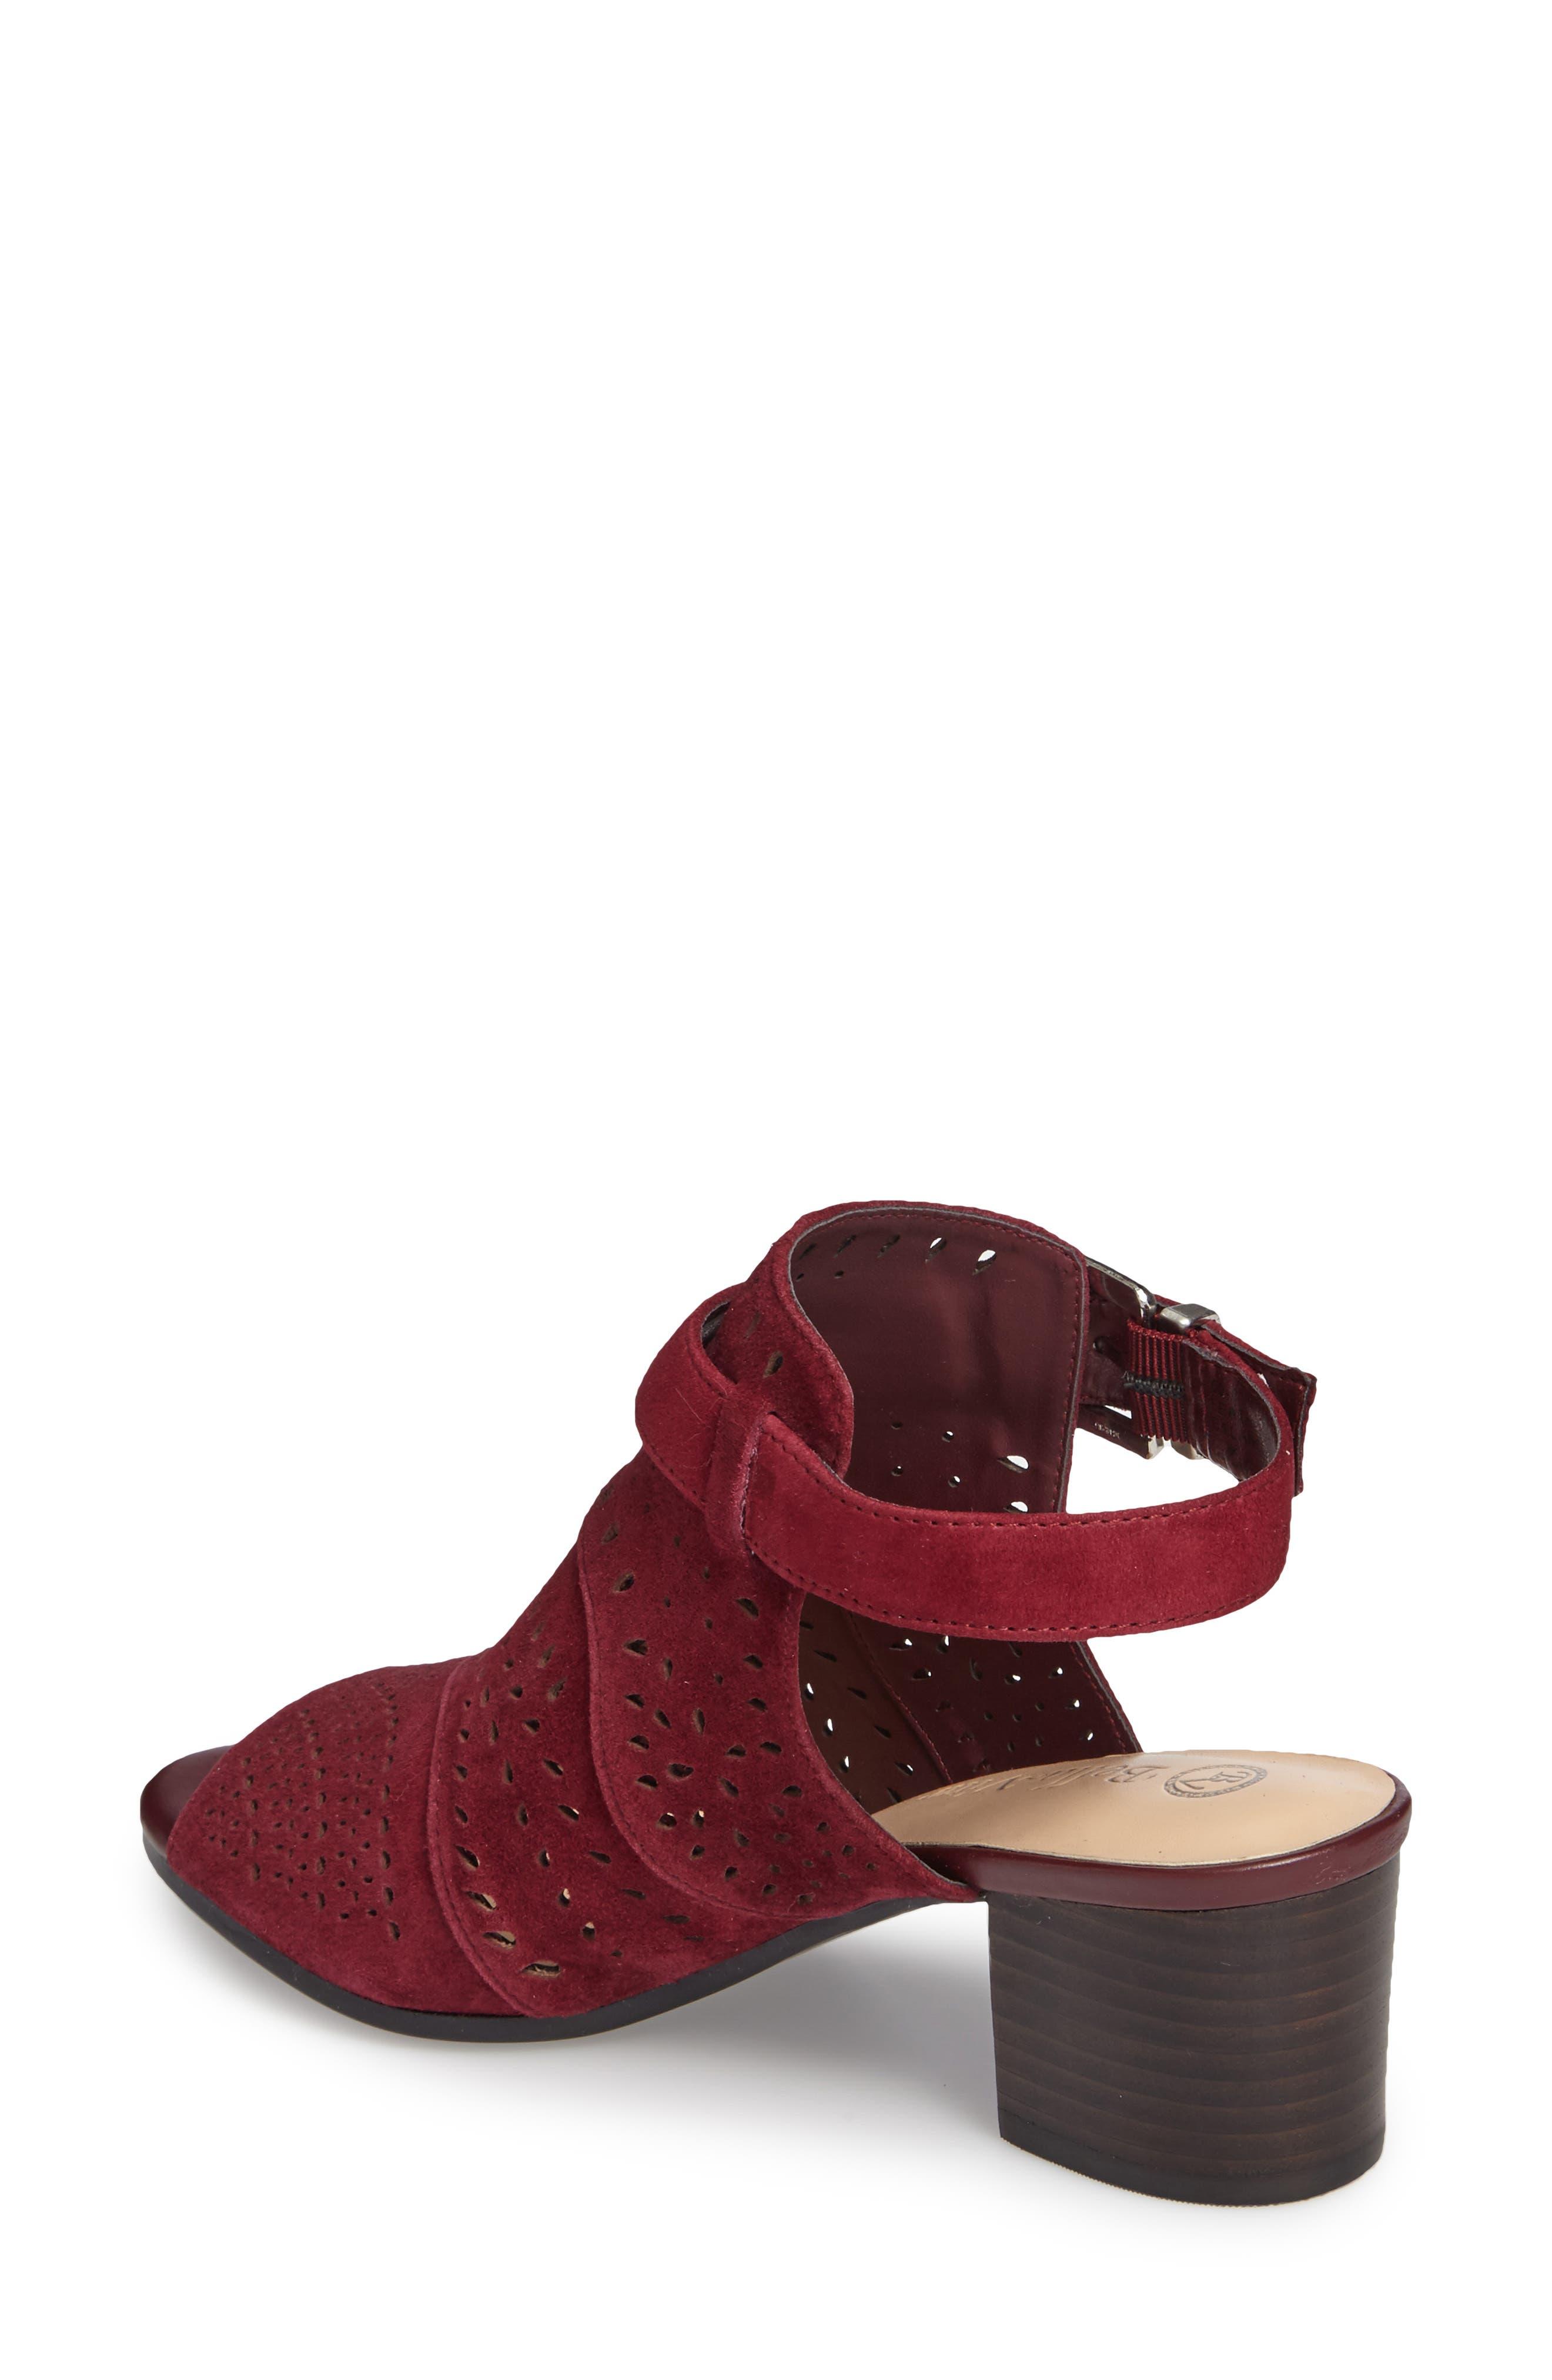 Fonda Perforated Sandal,                             Alternate thumbnail 2, color,                             930